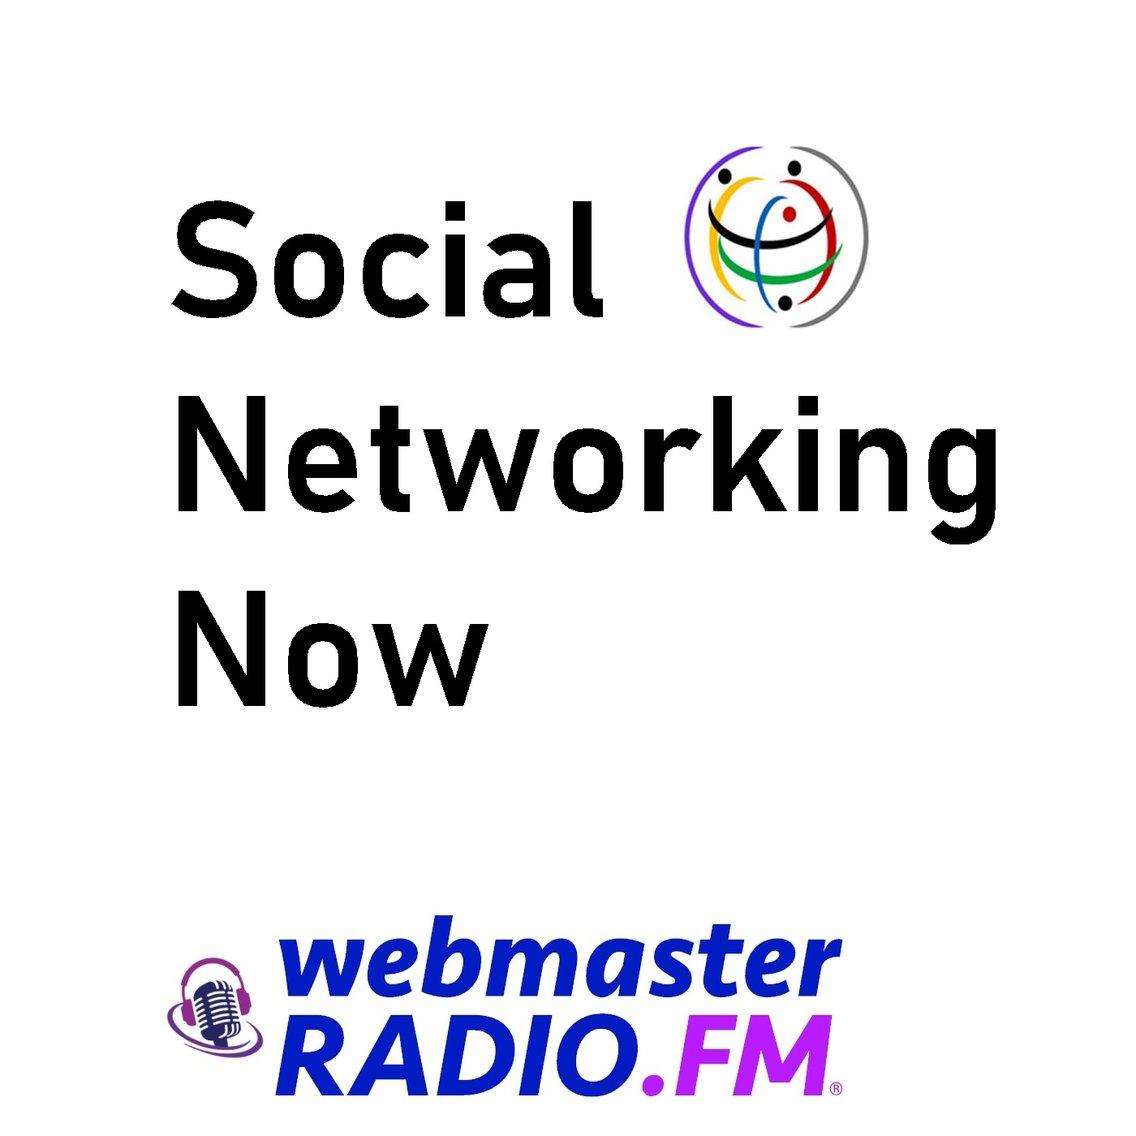 Social Networking Now - imagen de portada